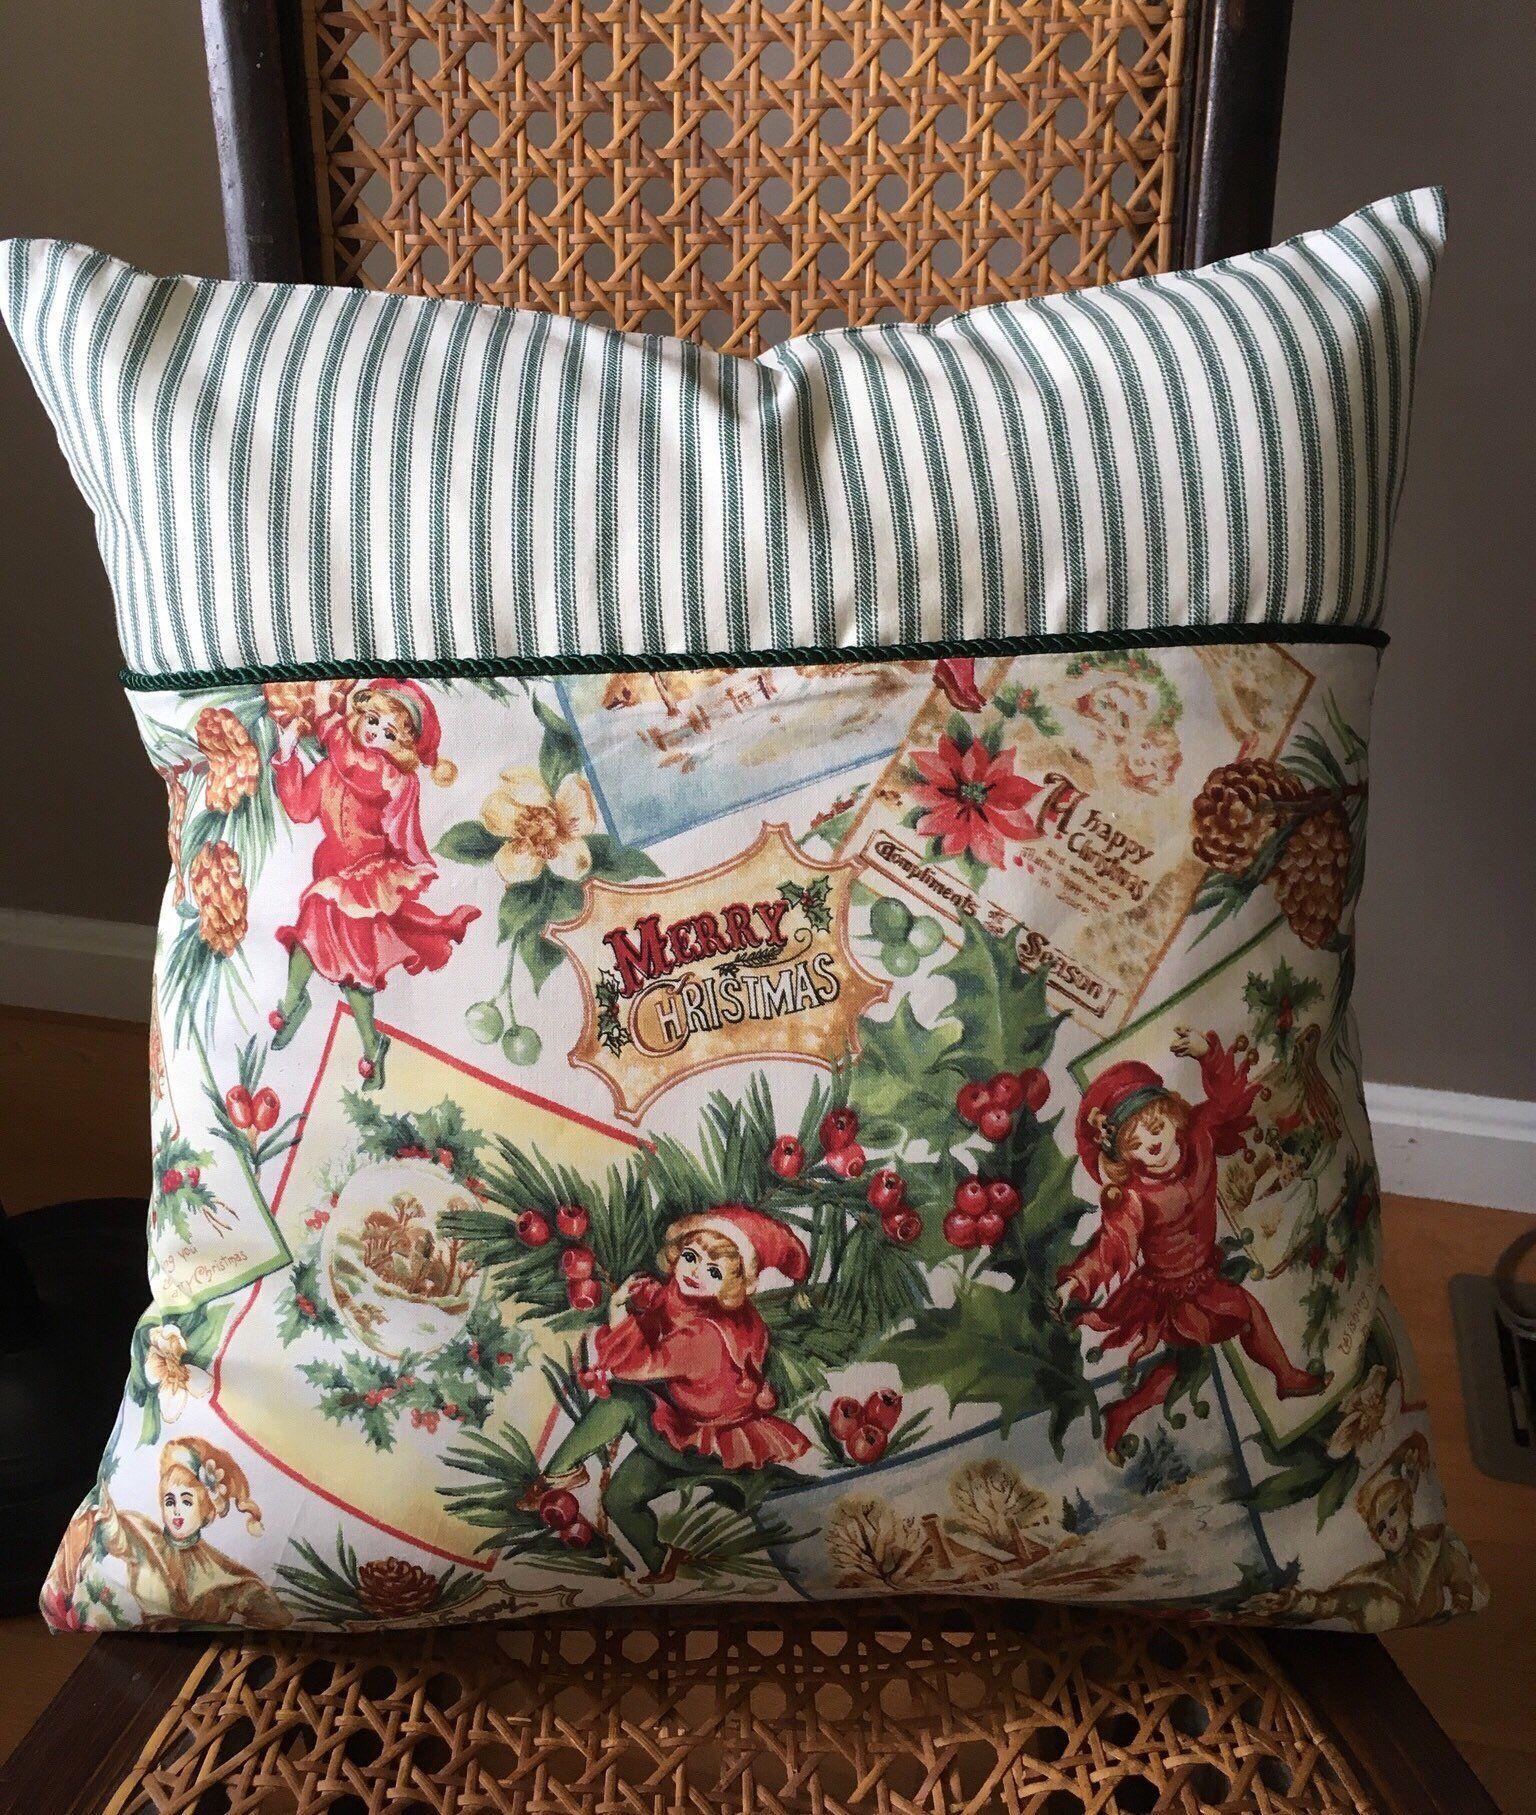 Christmas pillow vintage inspired christmas throw pillow cover